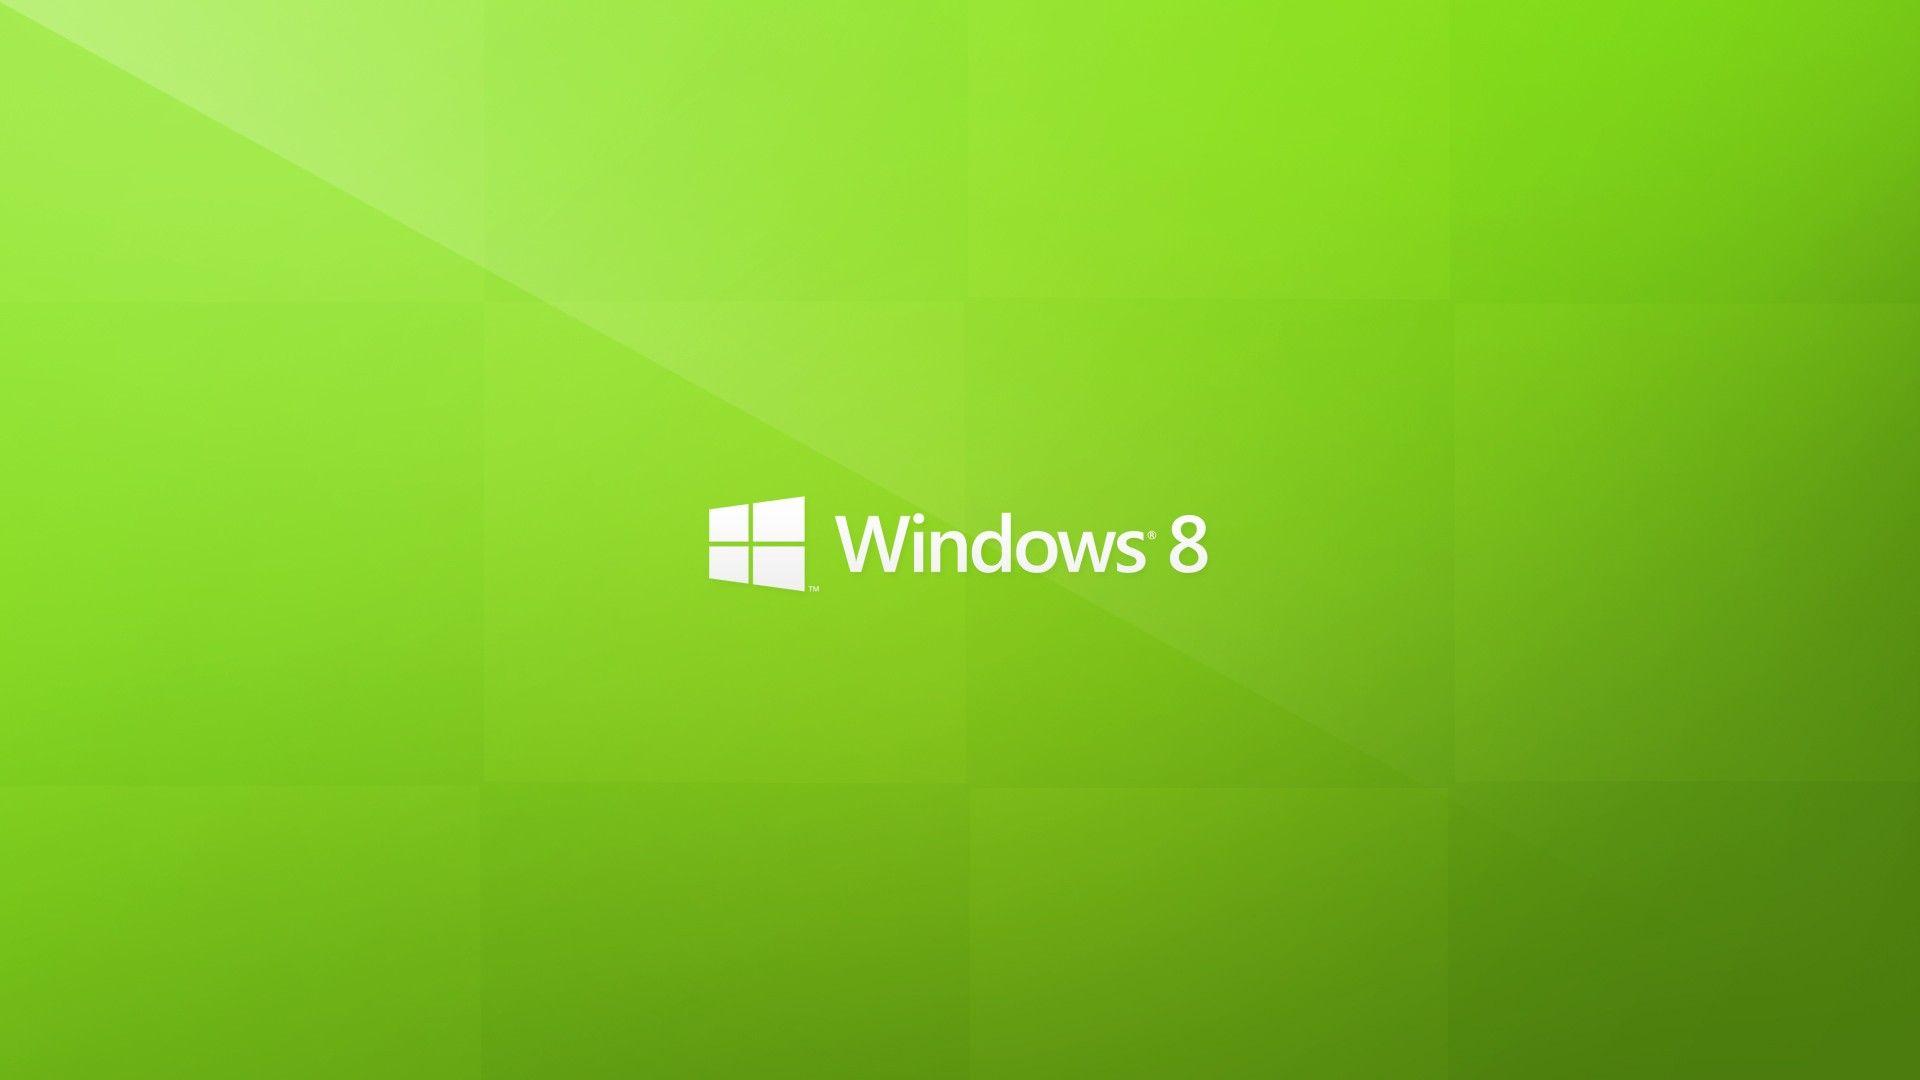 20 Widescreen Hd Wallpapers For Windows 8 Desktop Background Windows Wallpaper Wallpaper Windows 10 Desktop Pictures